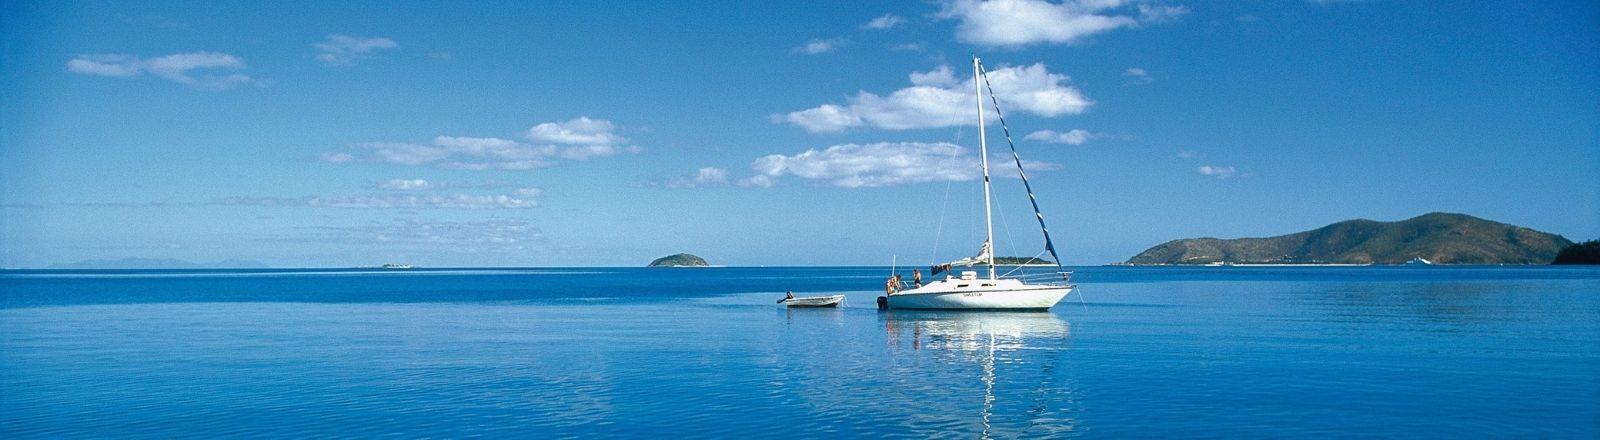 Bareboat Charters